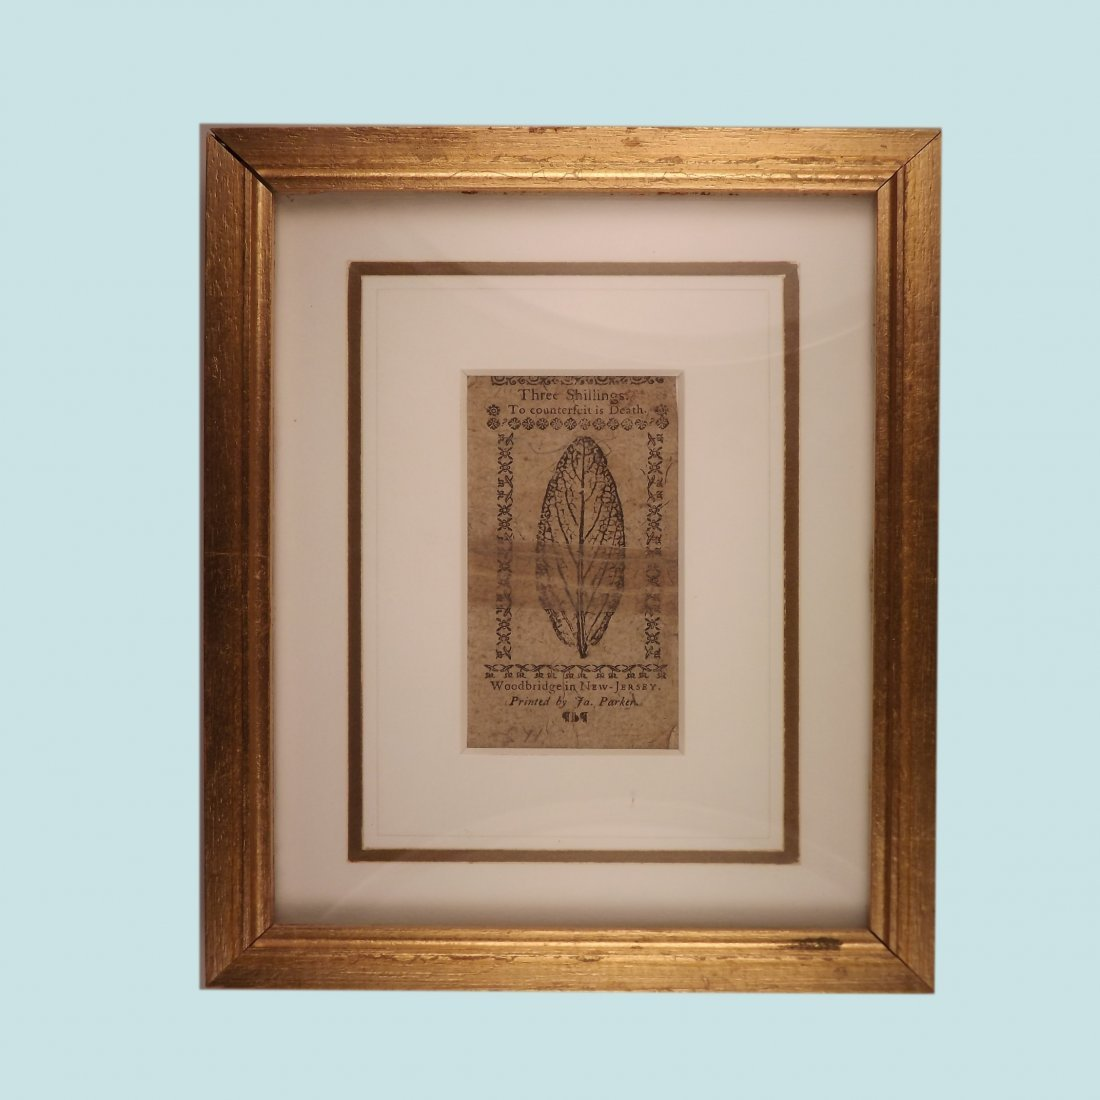 Framed 3 Shilling Paper Note Dated December 3rd, 1763